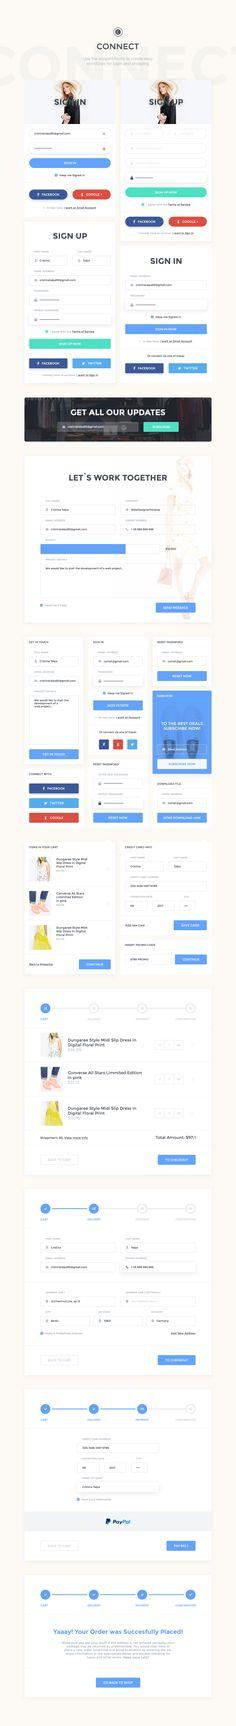 Comet Ecommerce UI Kit by Comet Shop on @creativemarket